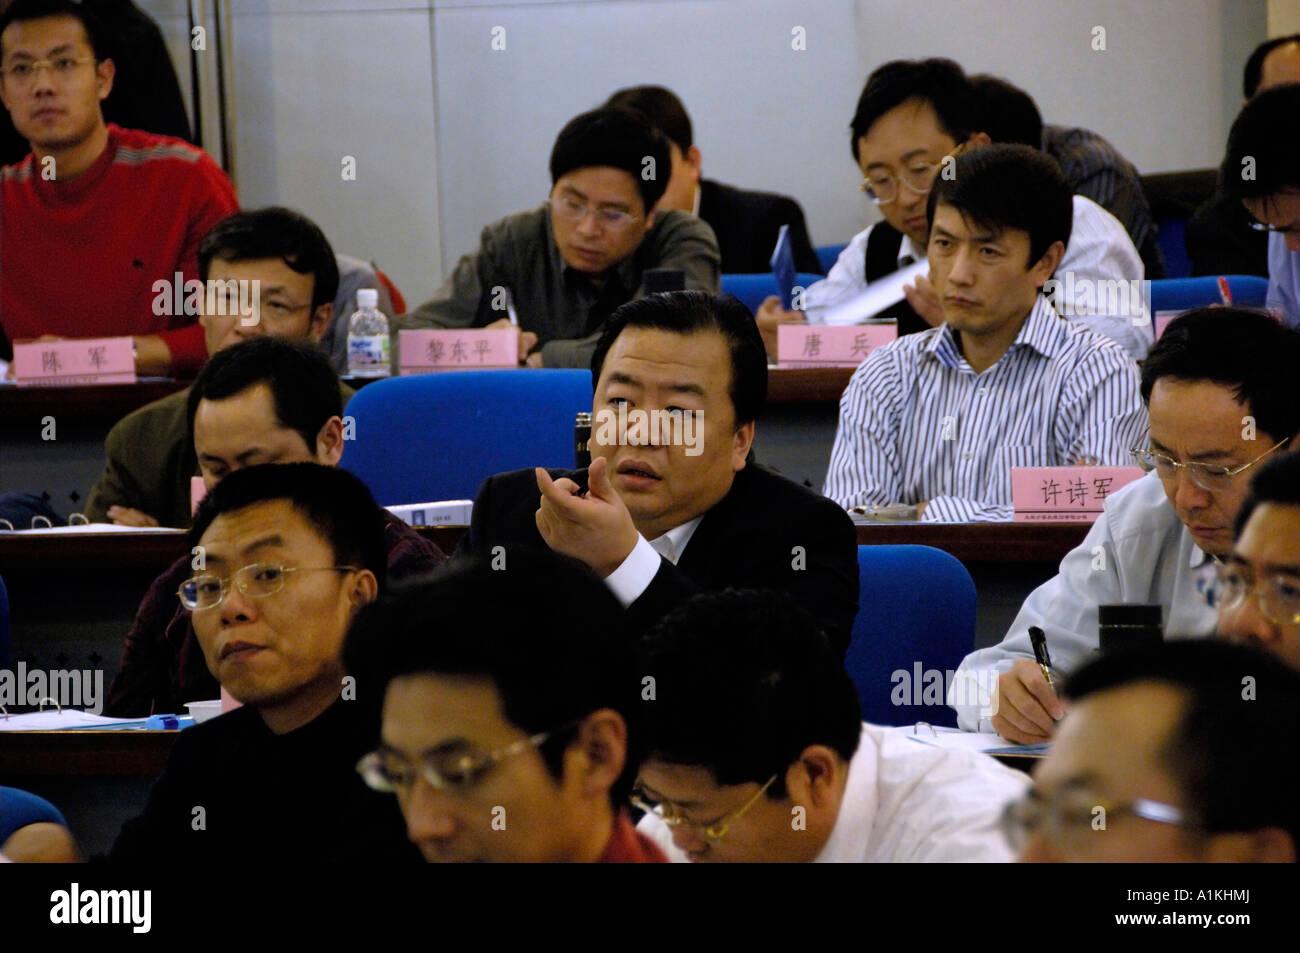 Tsinghua University EMBA class. 11 Nov 2006 - Stock Image